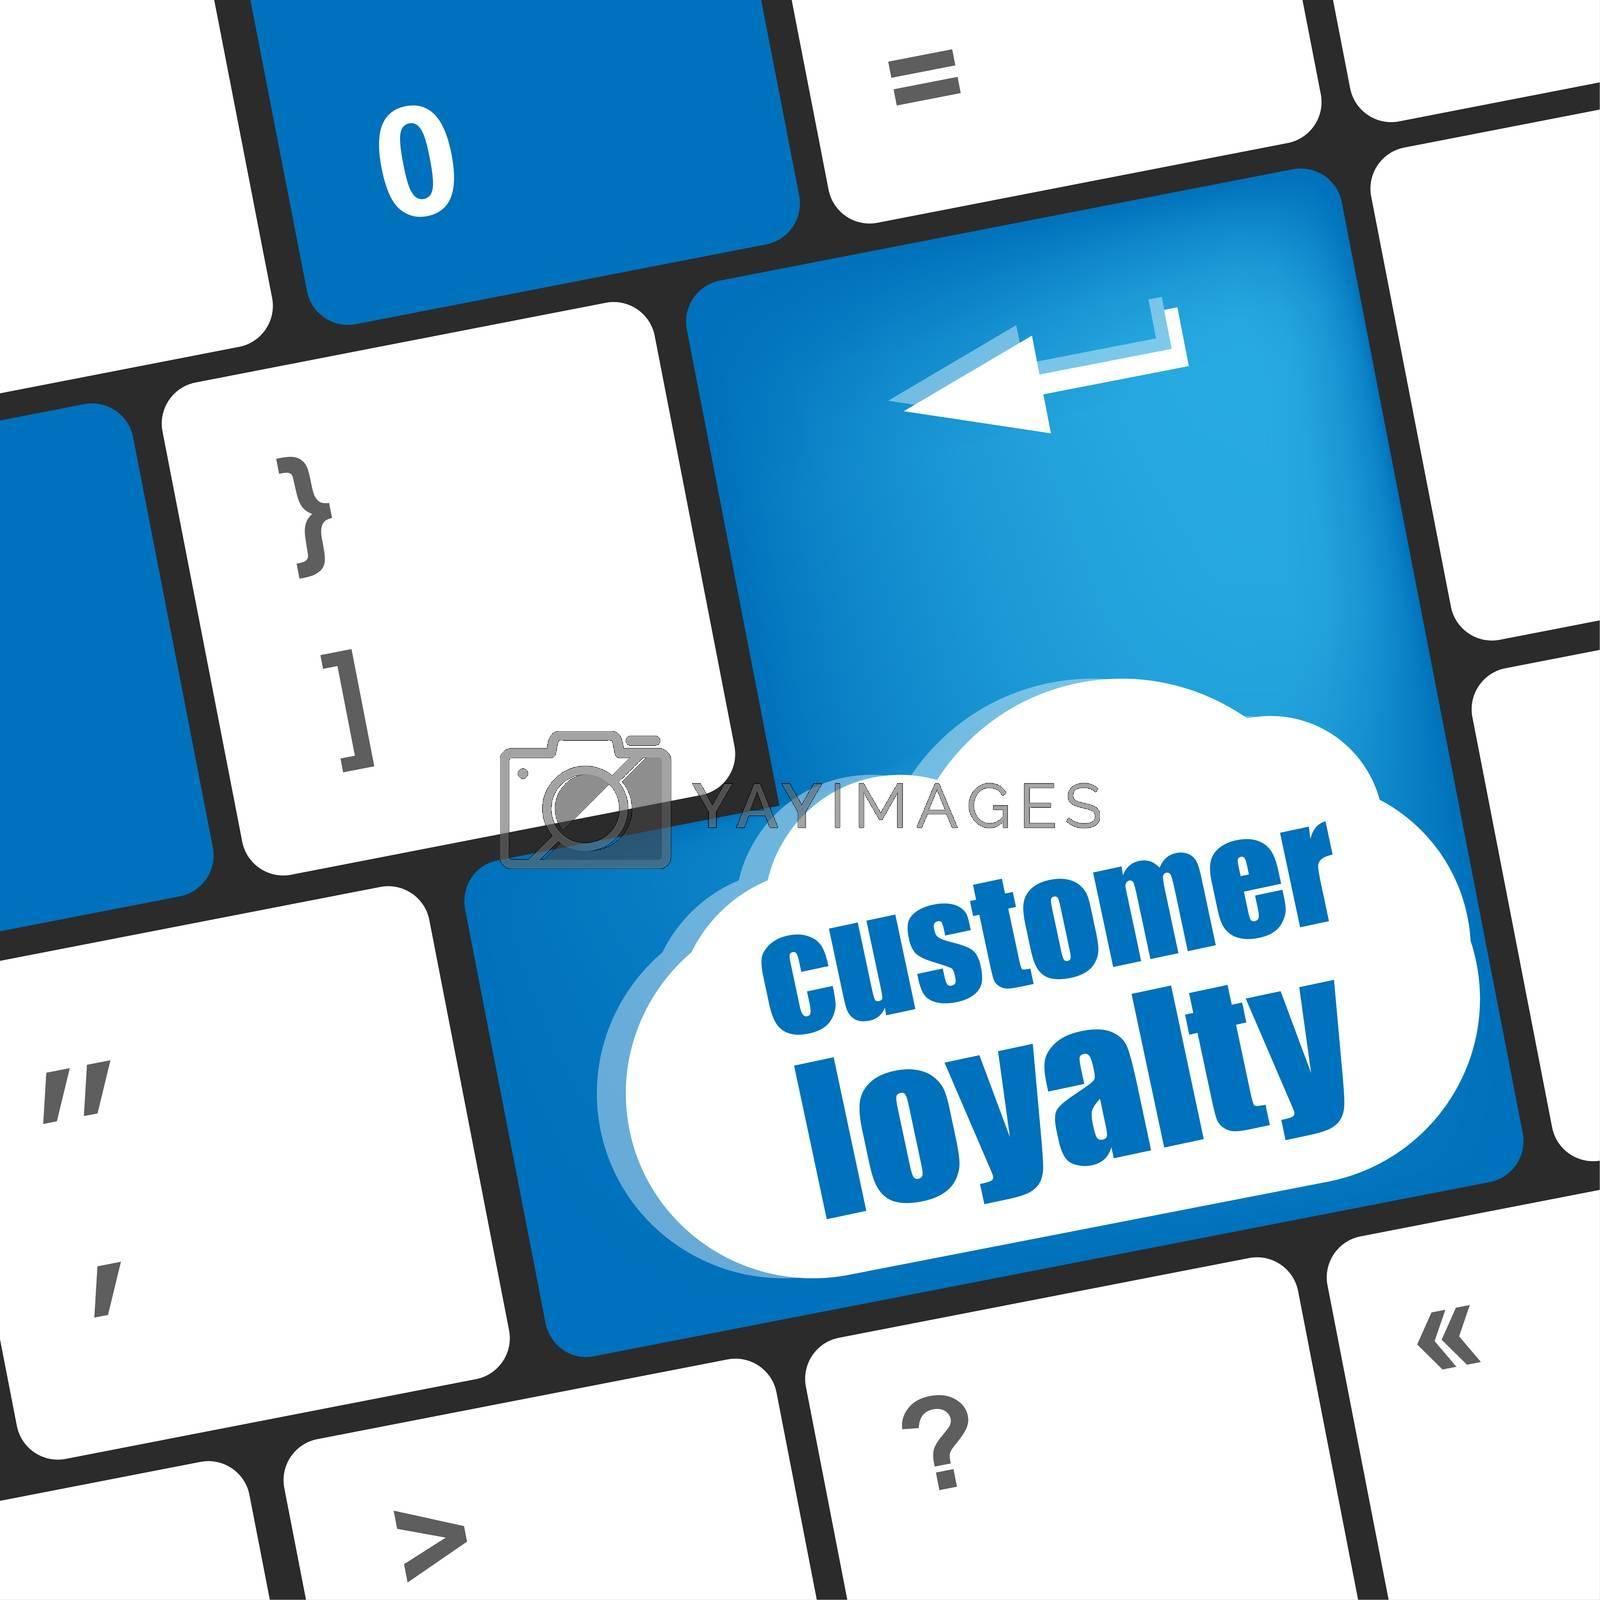 button keypad key with customer loyalty words